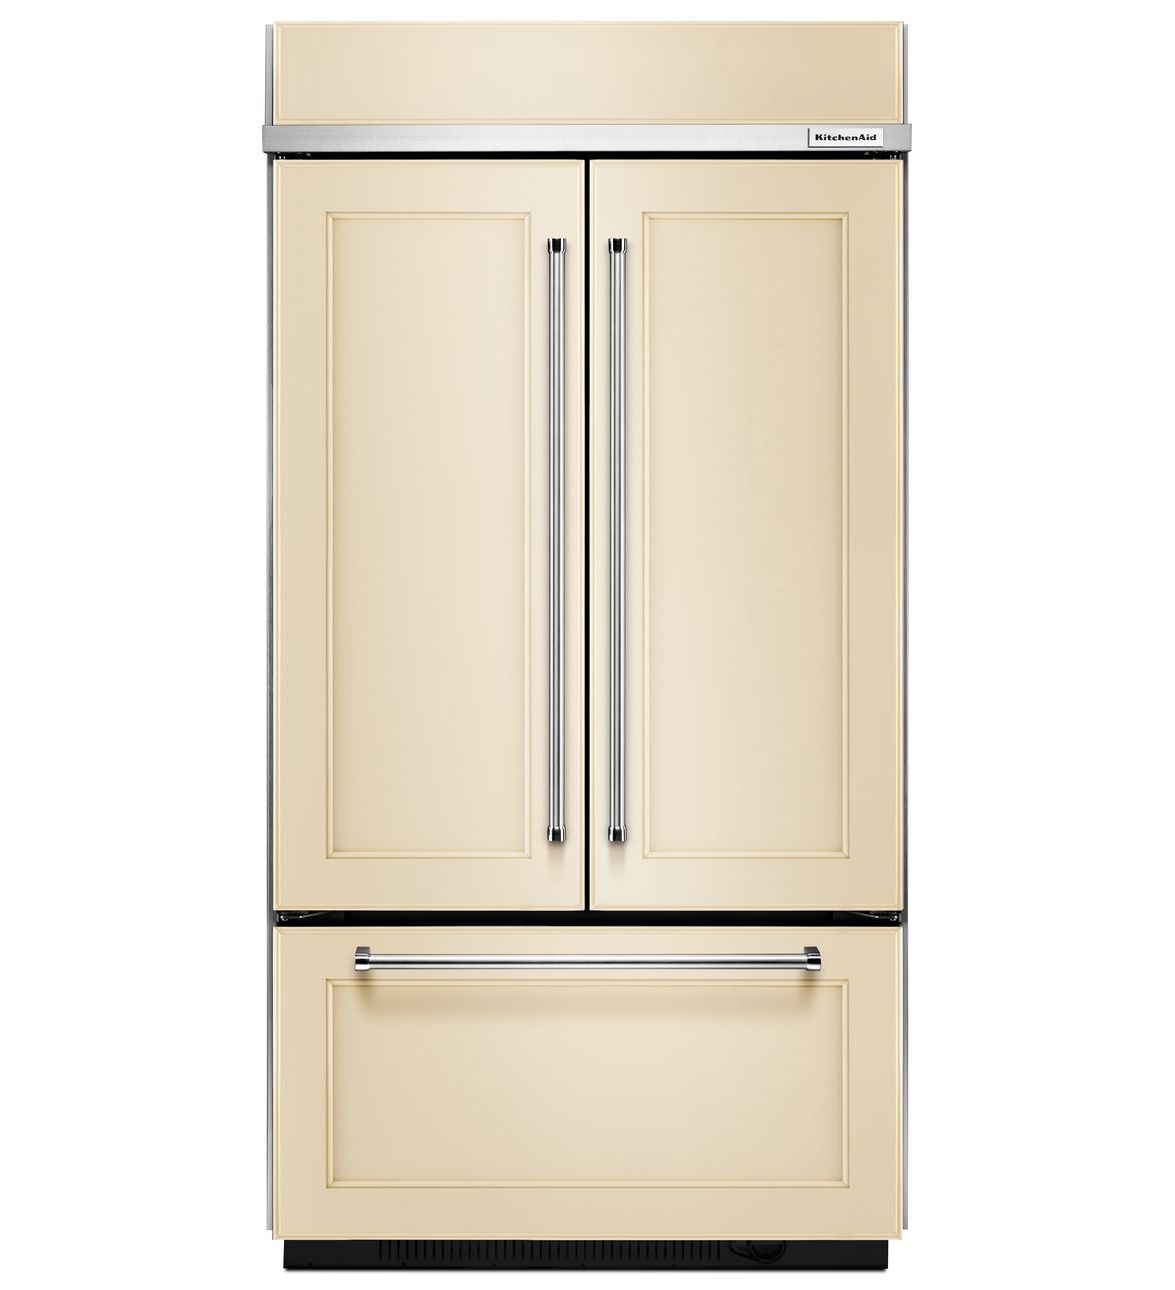 "Kitchenaid 43 24 2 Cu Ft Built In French Door: KitchenAid KBFN502EBS 42"" 24.2 Cu. Ft. Width Built-In"